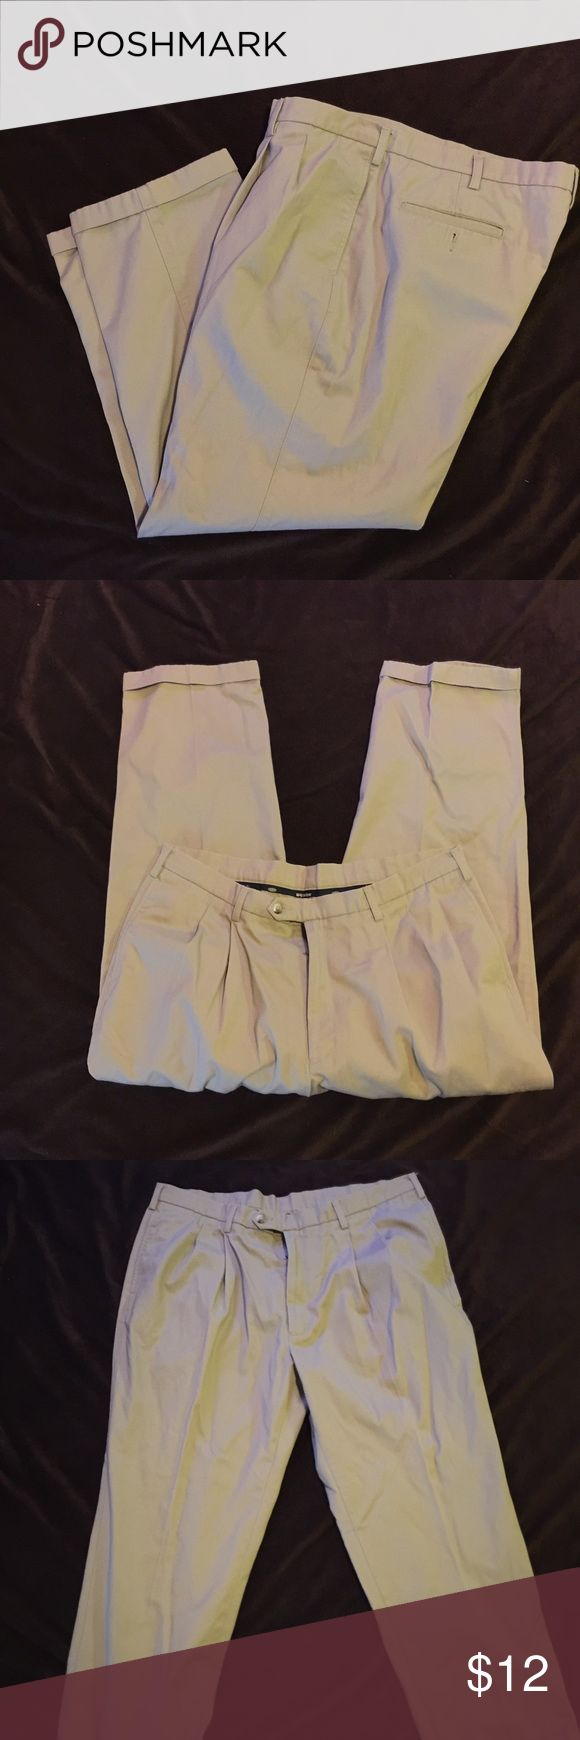 Motion SAVANE men trouser. MOTION SAVANE men trouser. Kaki color. 100% cotton. Great condition. MOTION SAVANE Pants Chinos & Khakis